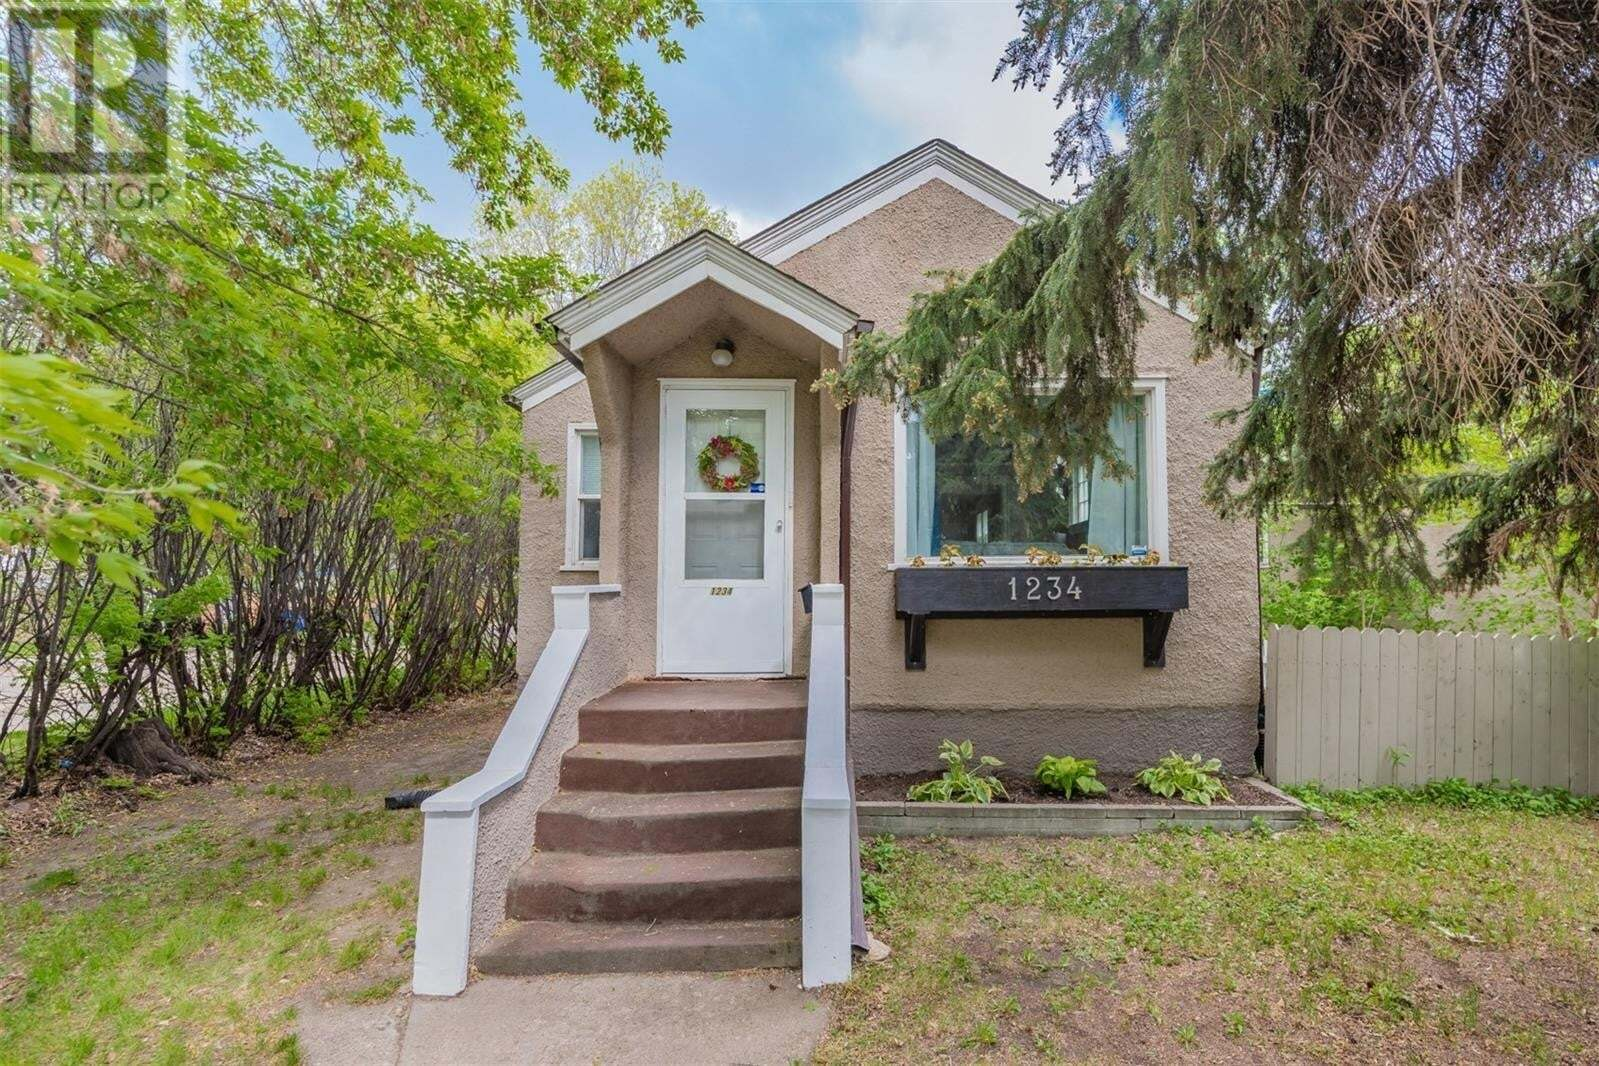 House for sale at 1234 E Ave N Saskatoon Saskatchewan - MLS: SK810056